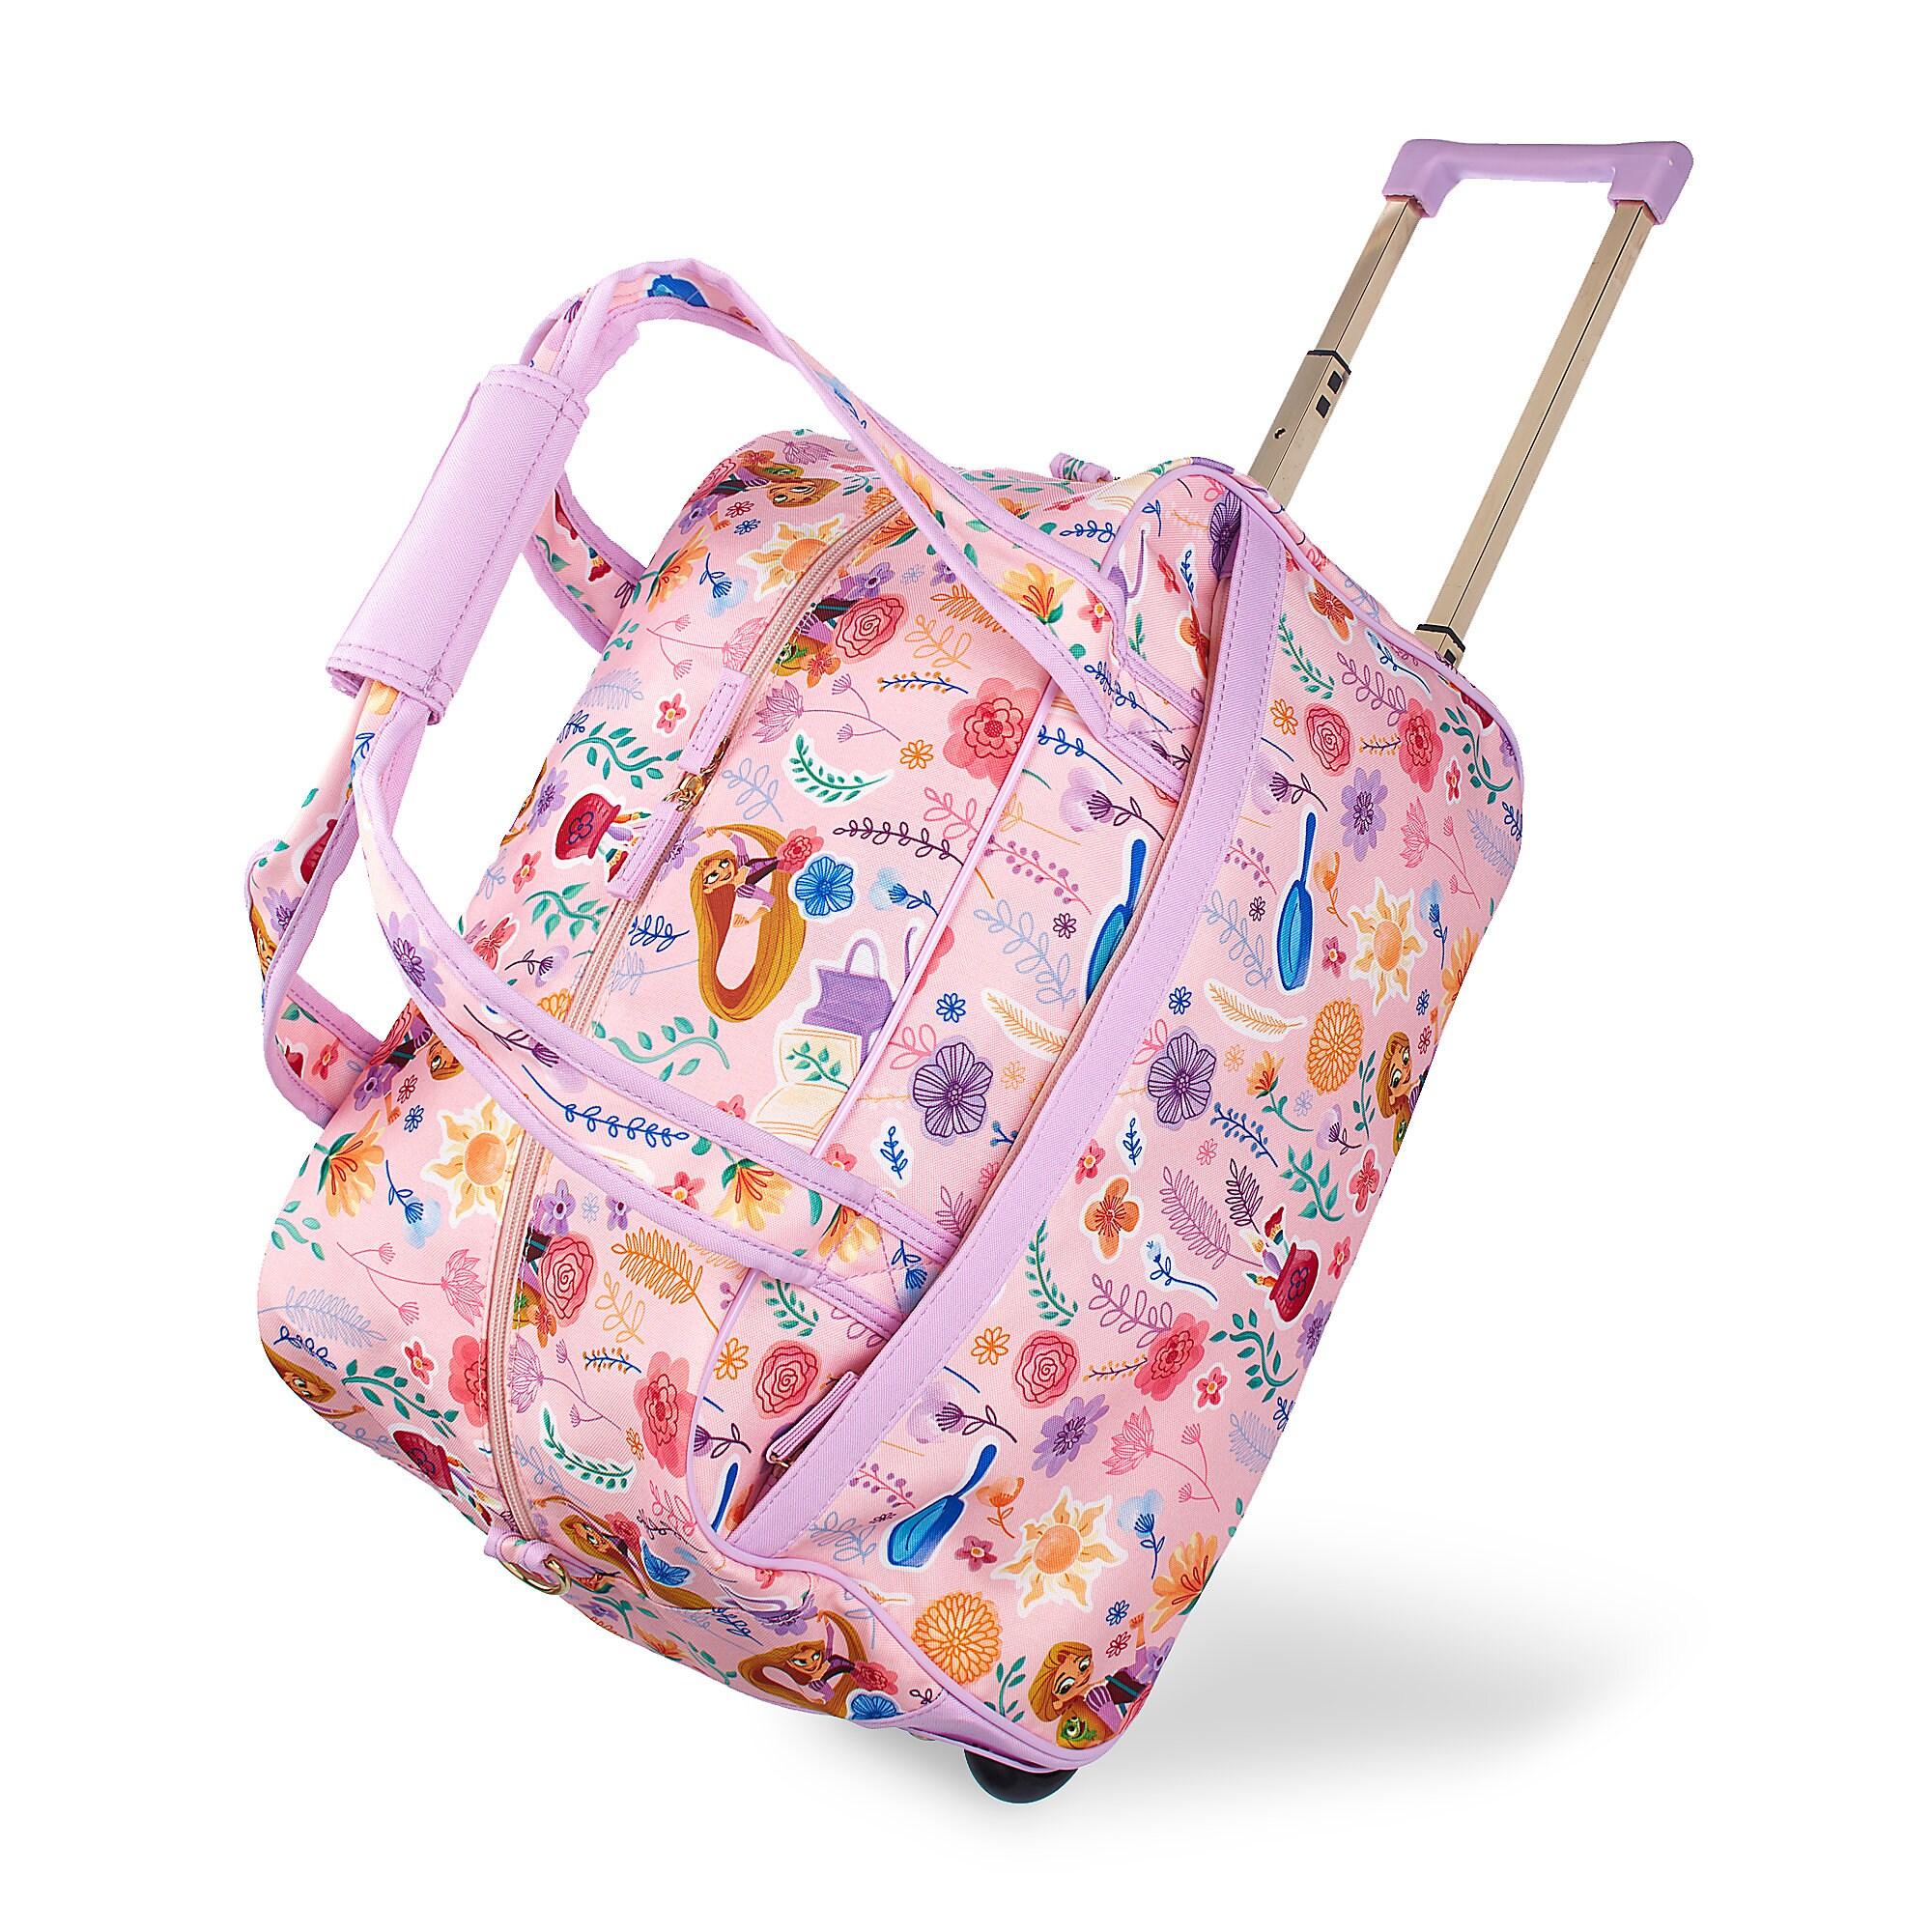 Rapunzel Rolling Luggage